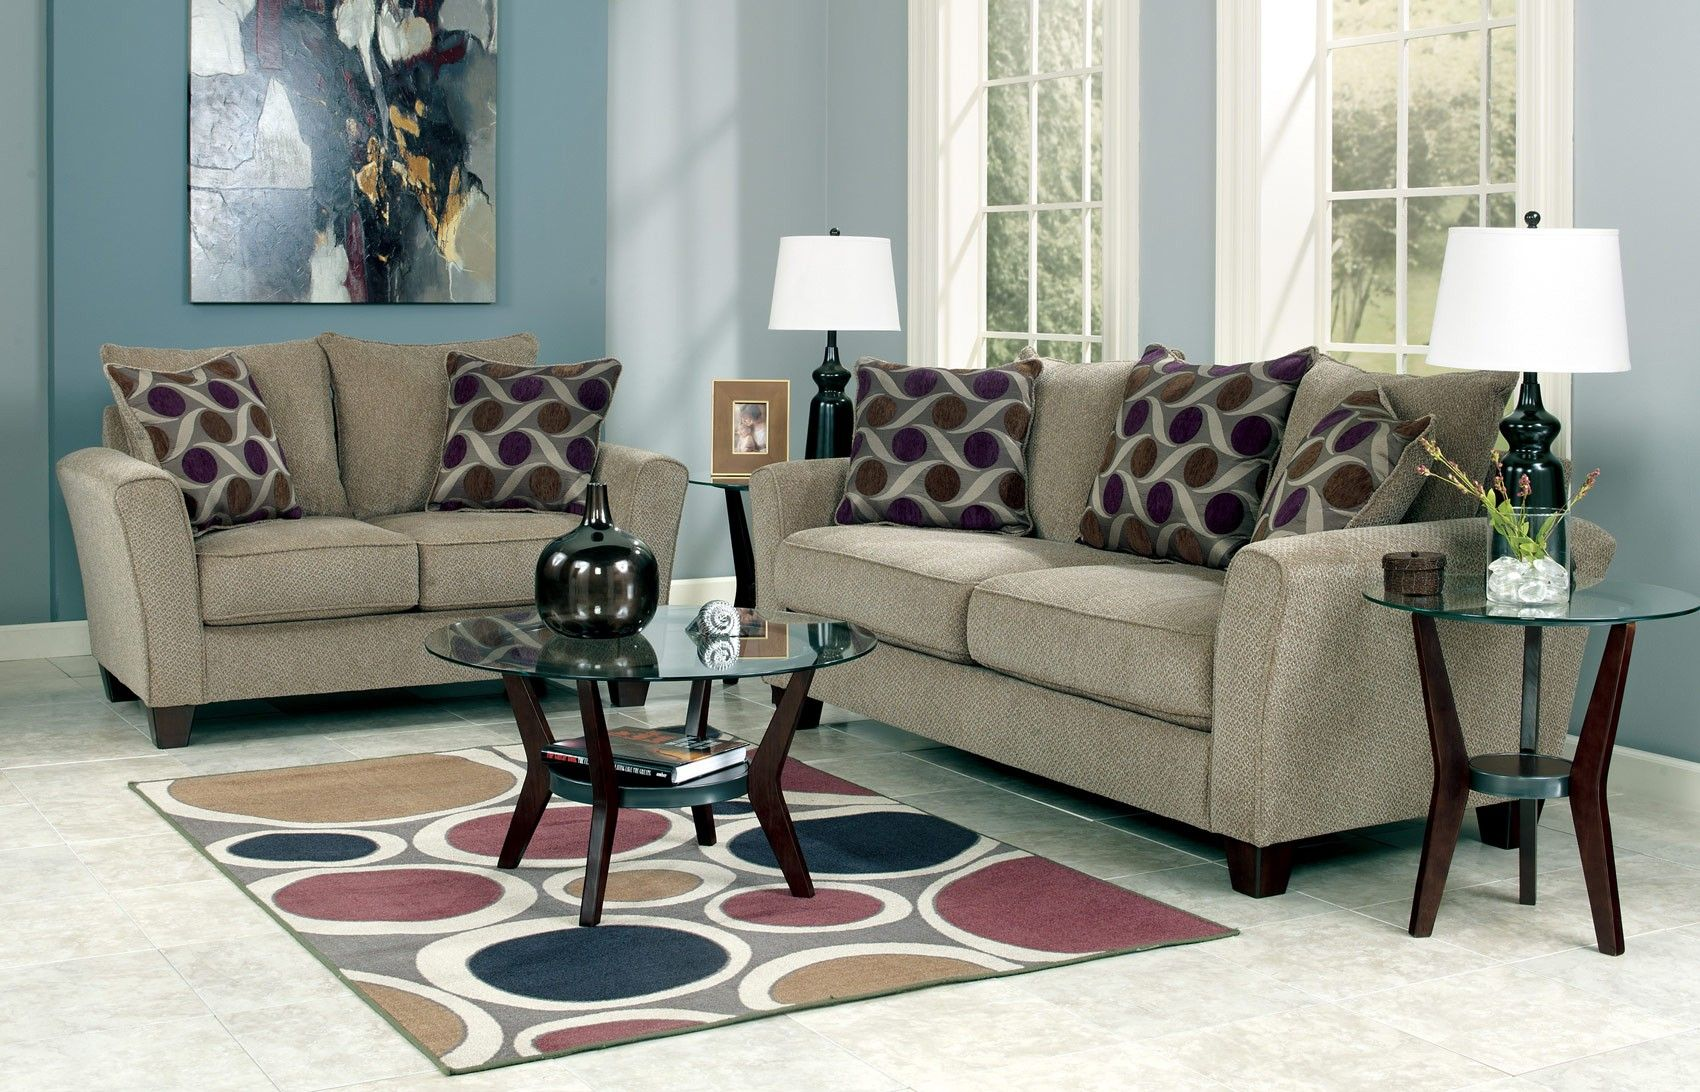 Trinsic Pebble Sofa And Loveseat Set 13301  Ashley Furniture  Living Room  Wohnzimmer design